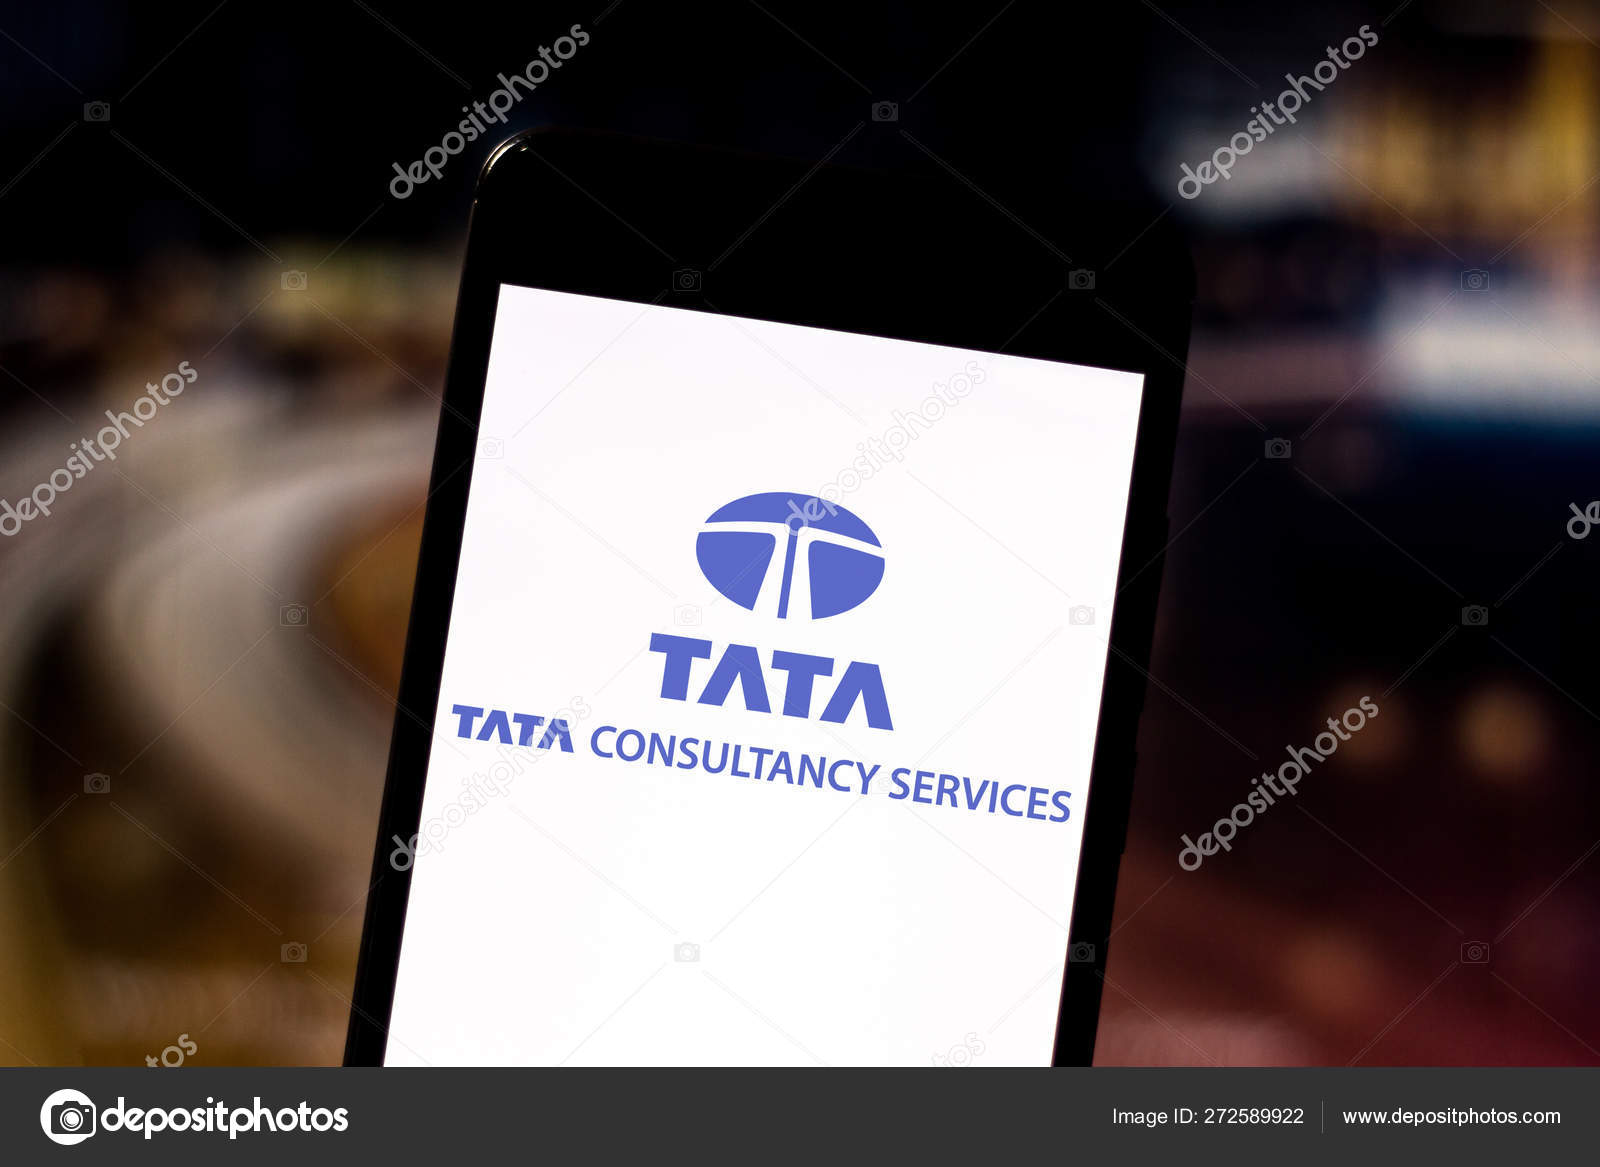 tata consultancy services logo download